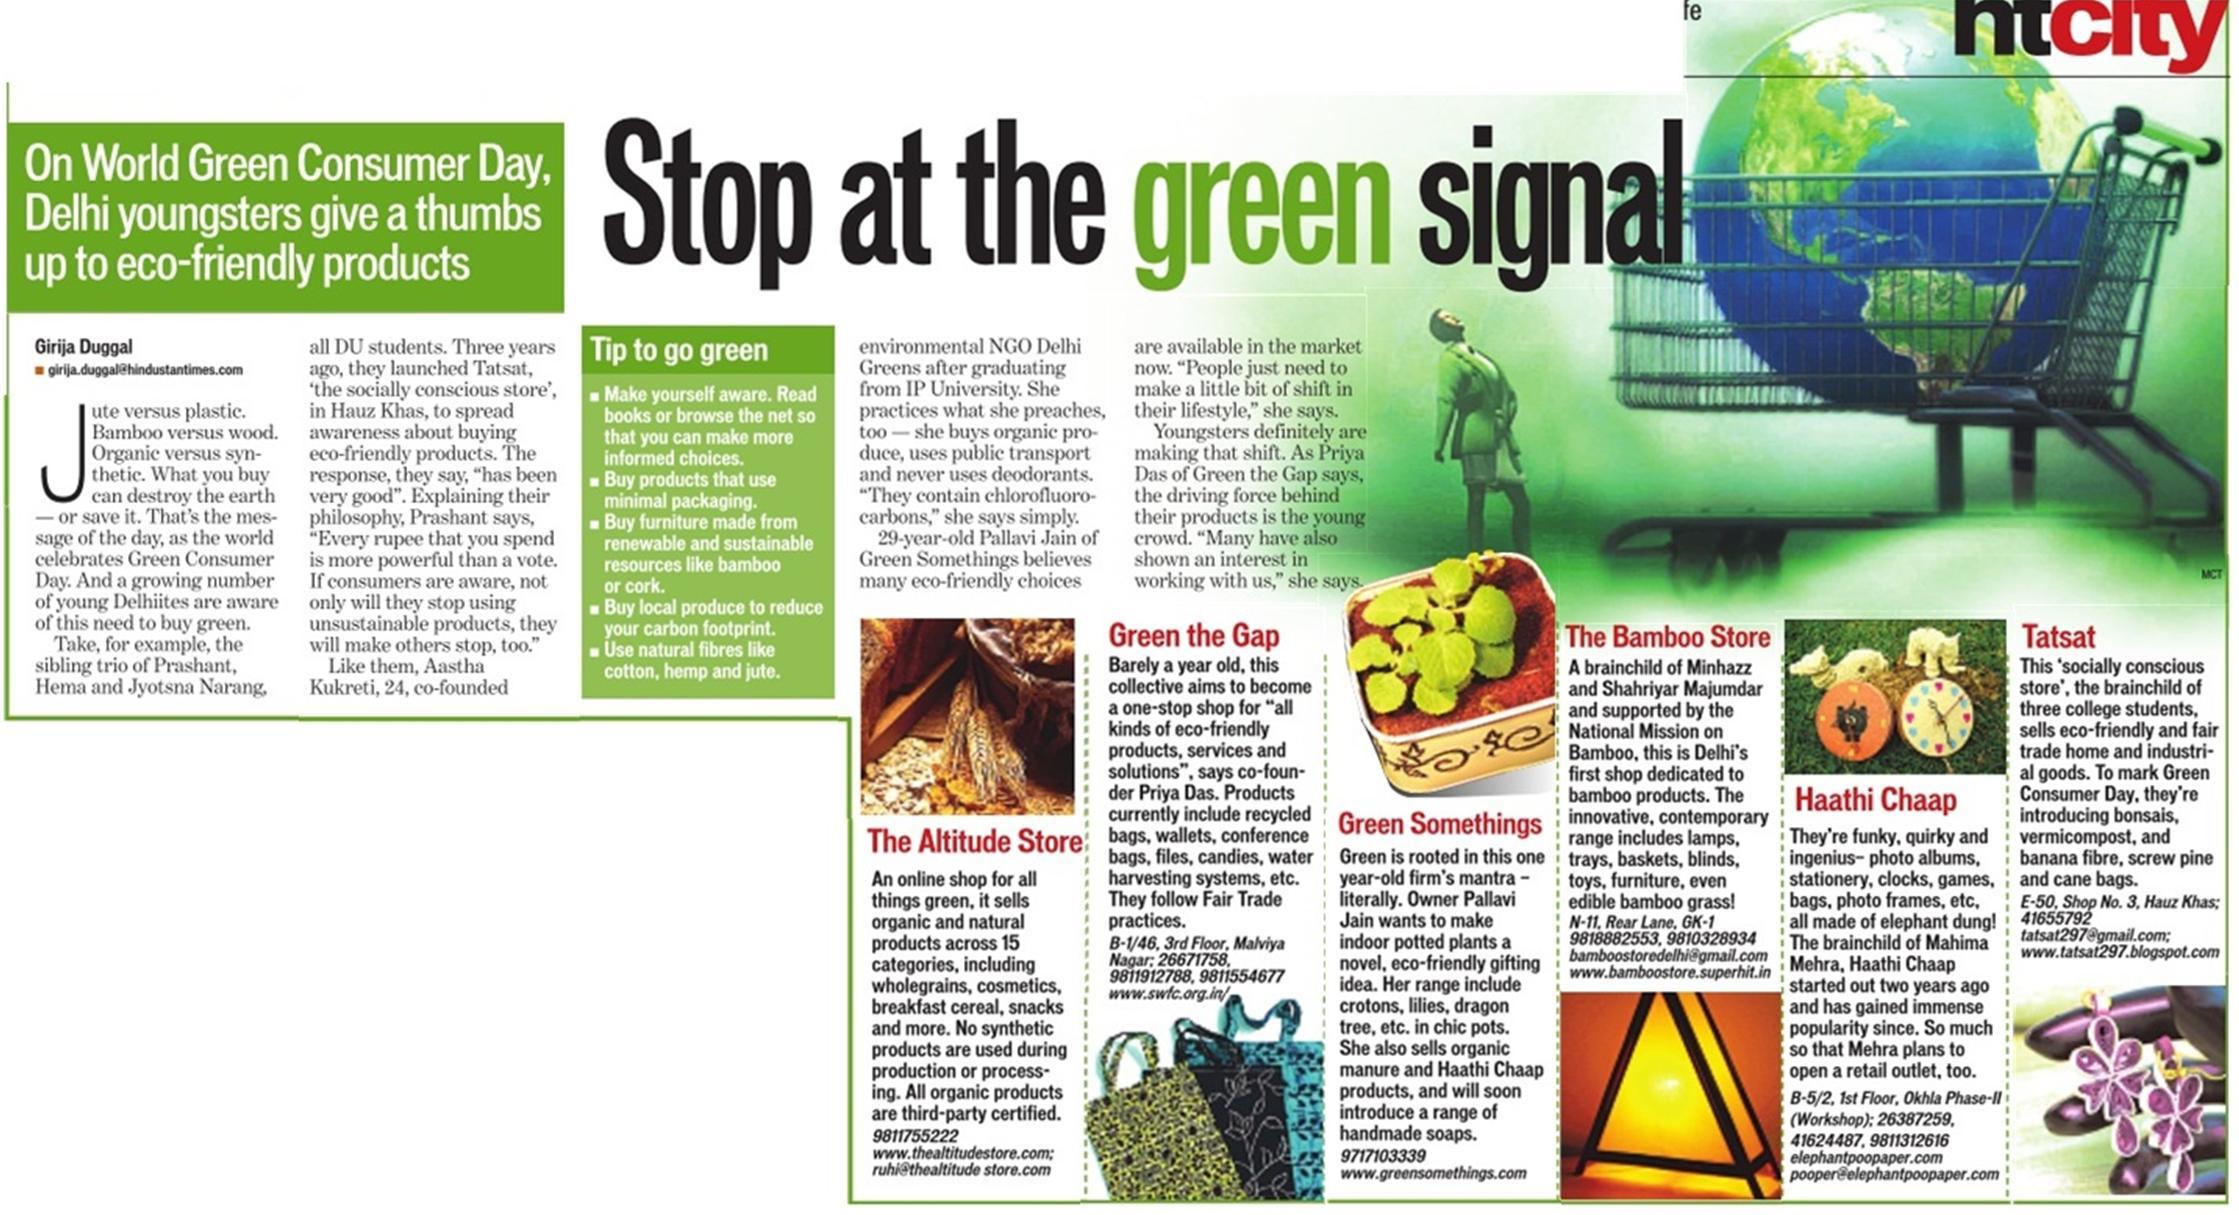 Stop at the Green Signal - Green Consumer Day, Hindustan Times